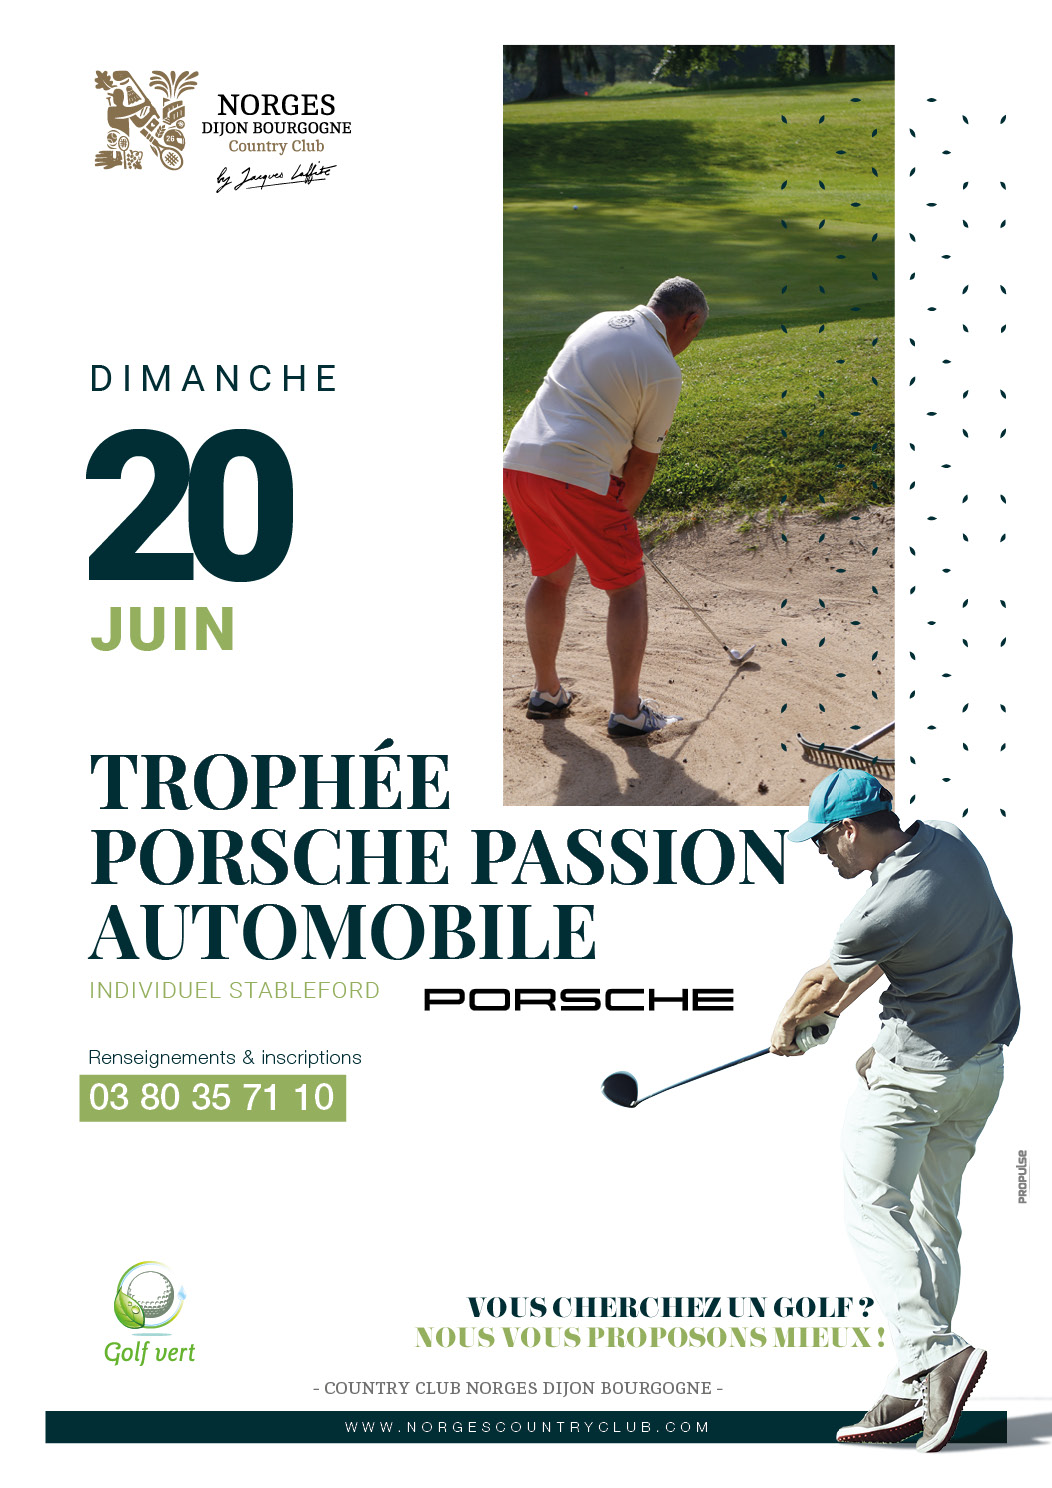 Trophée Porsche